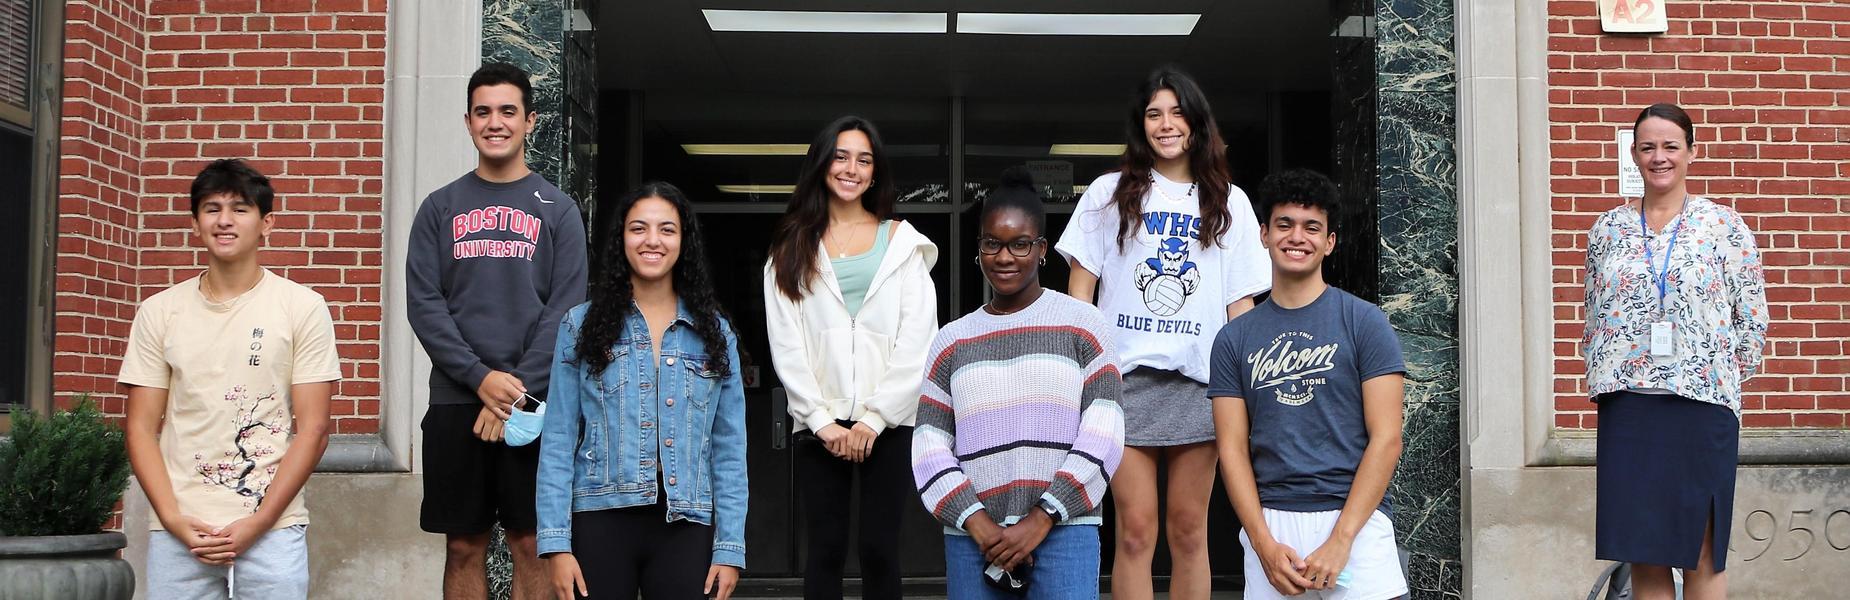 WHS Principal Mary Asfendis (right) congratulates College Board Recognition Program Scholars.  From left:  Mateo Belran, John González, Amira Lee, Victoria Vaca, Celia Frank, Taylor Addis, and Manuel González.